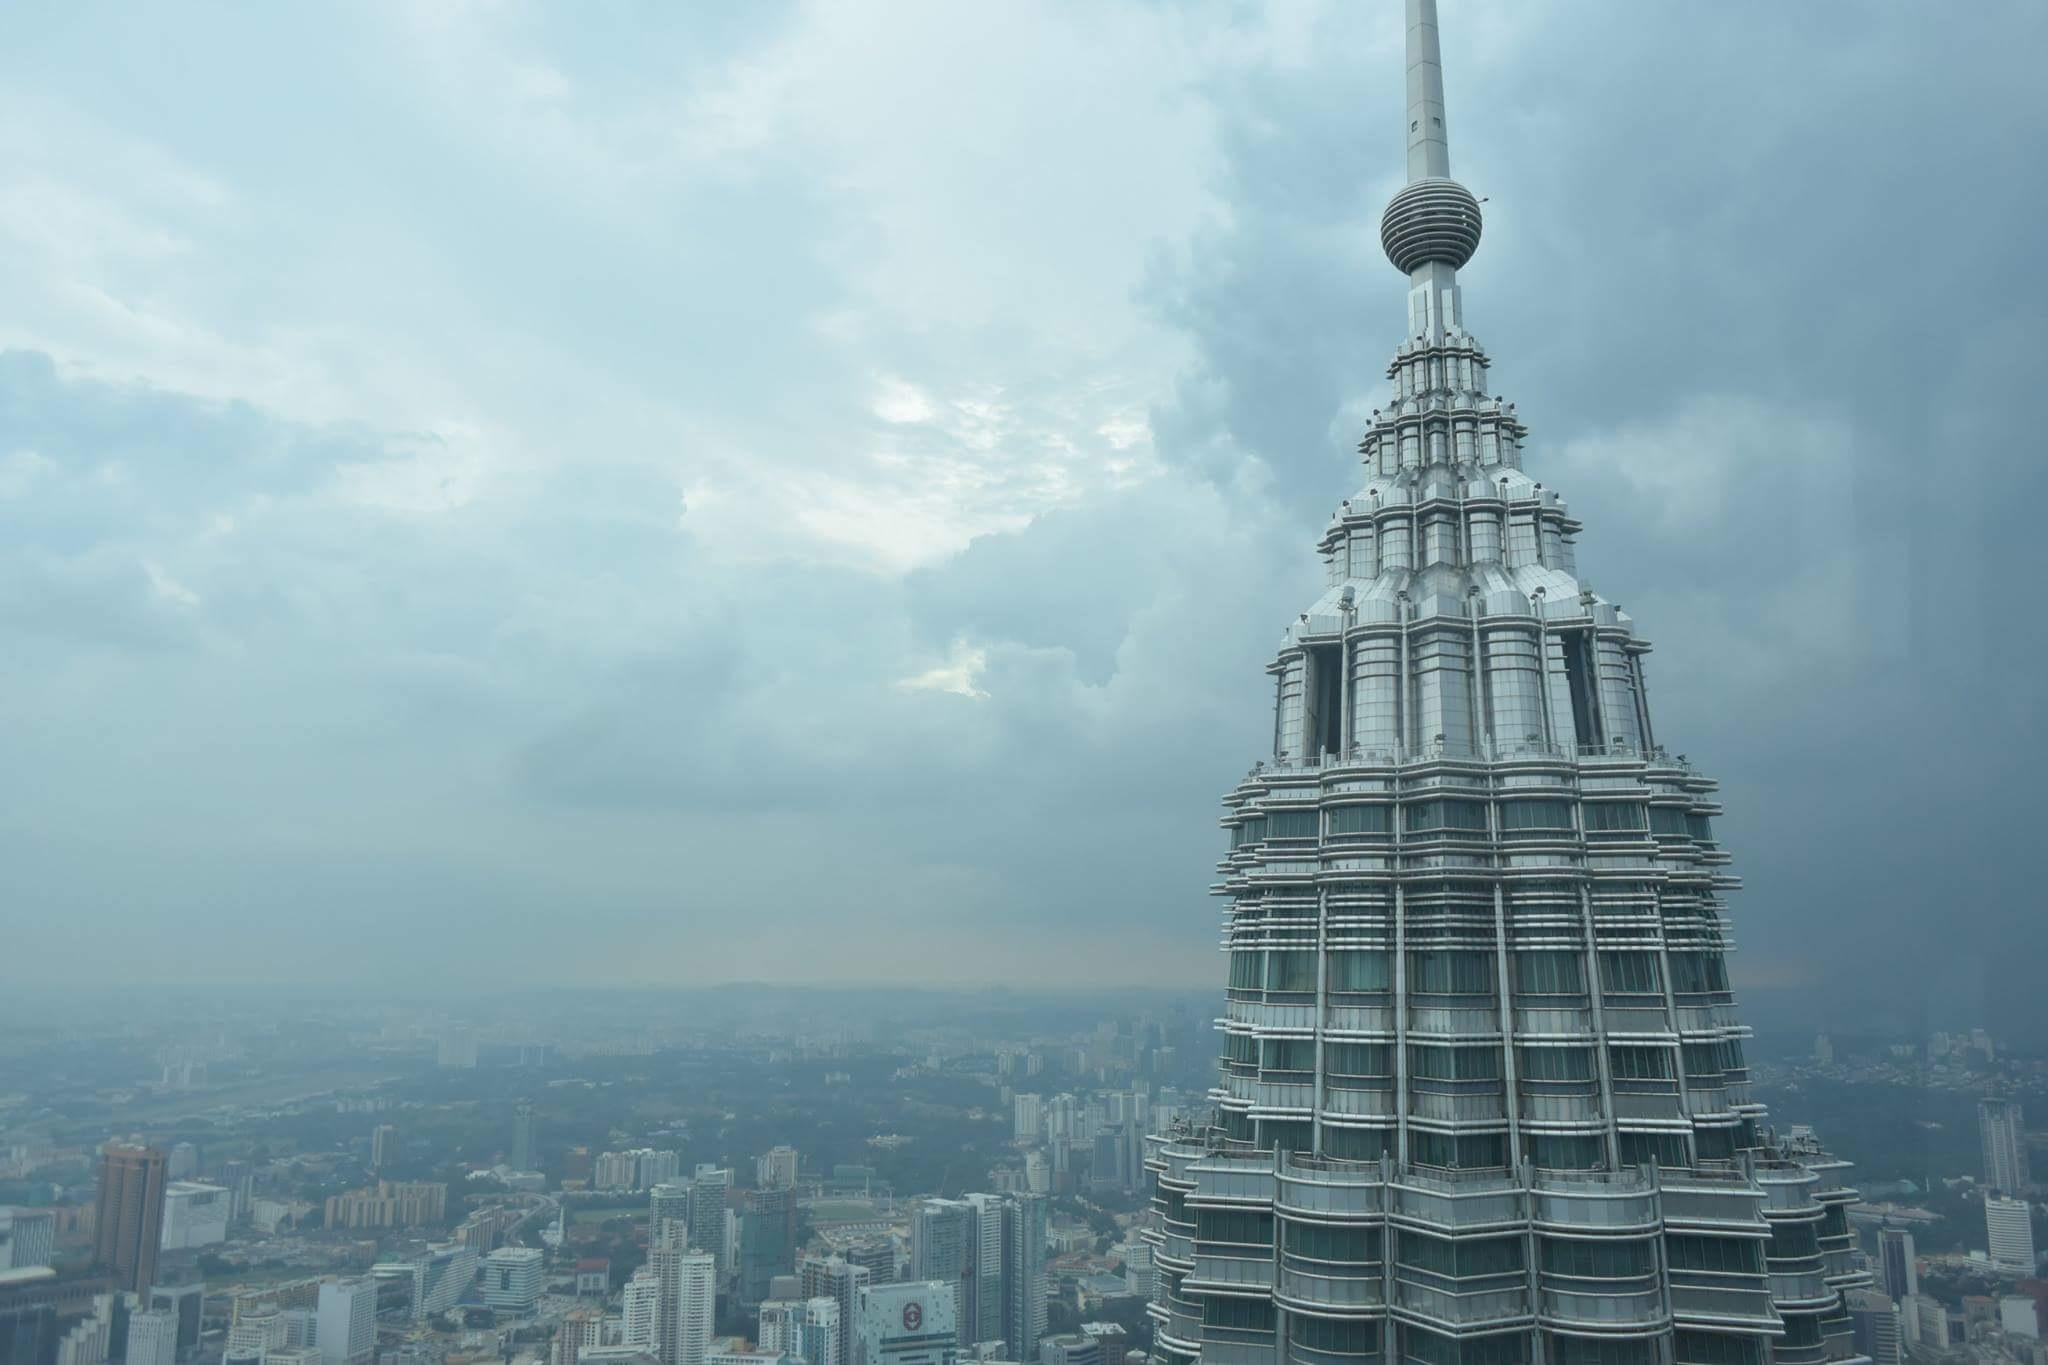 Twin towers by Tidar Jati Kelana